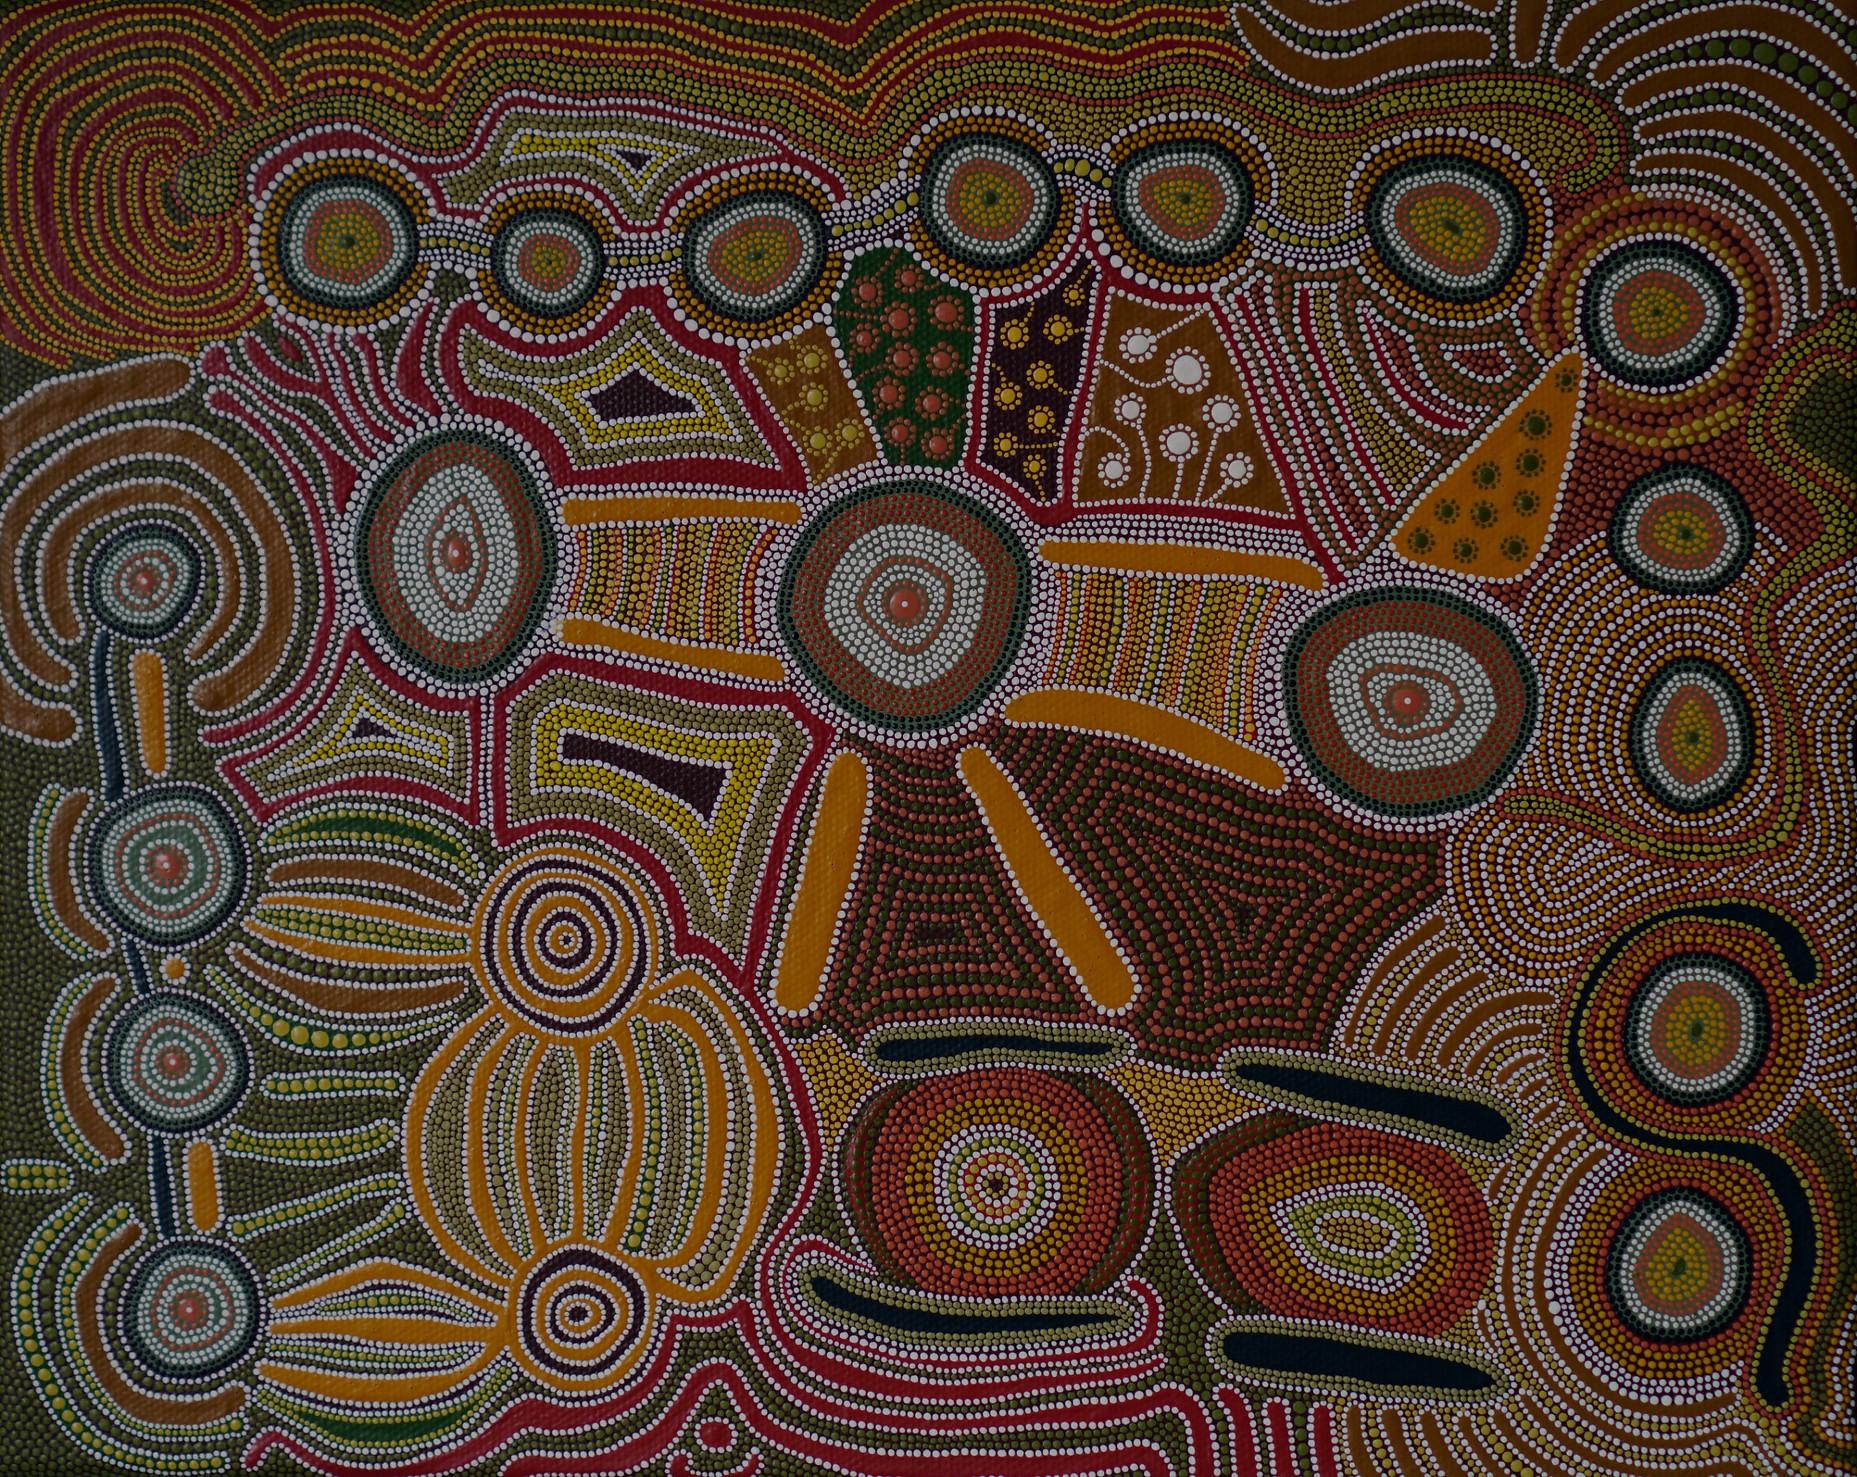 Aboriginal Style Dot Painting_edited.jpg